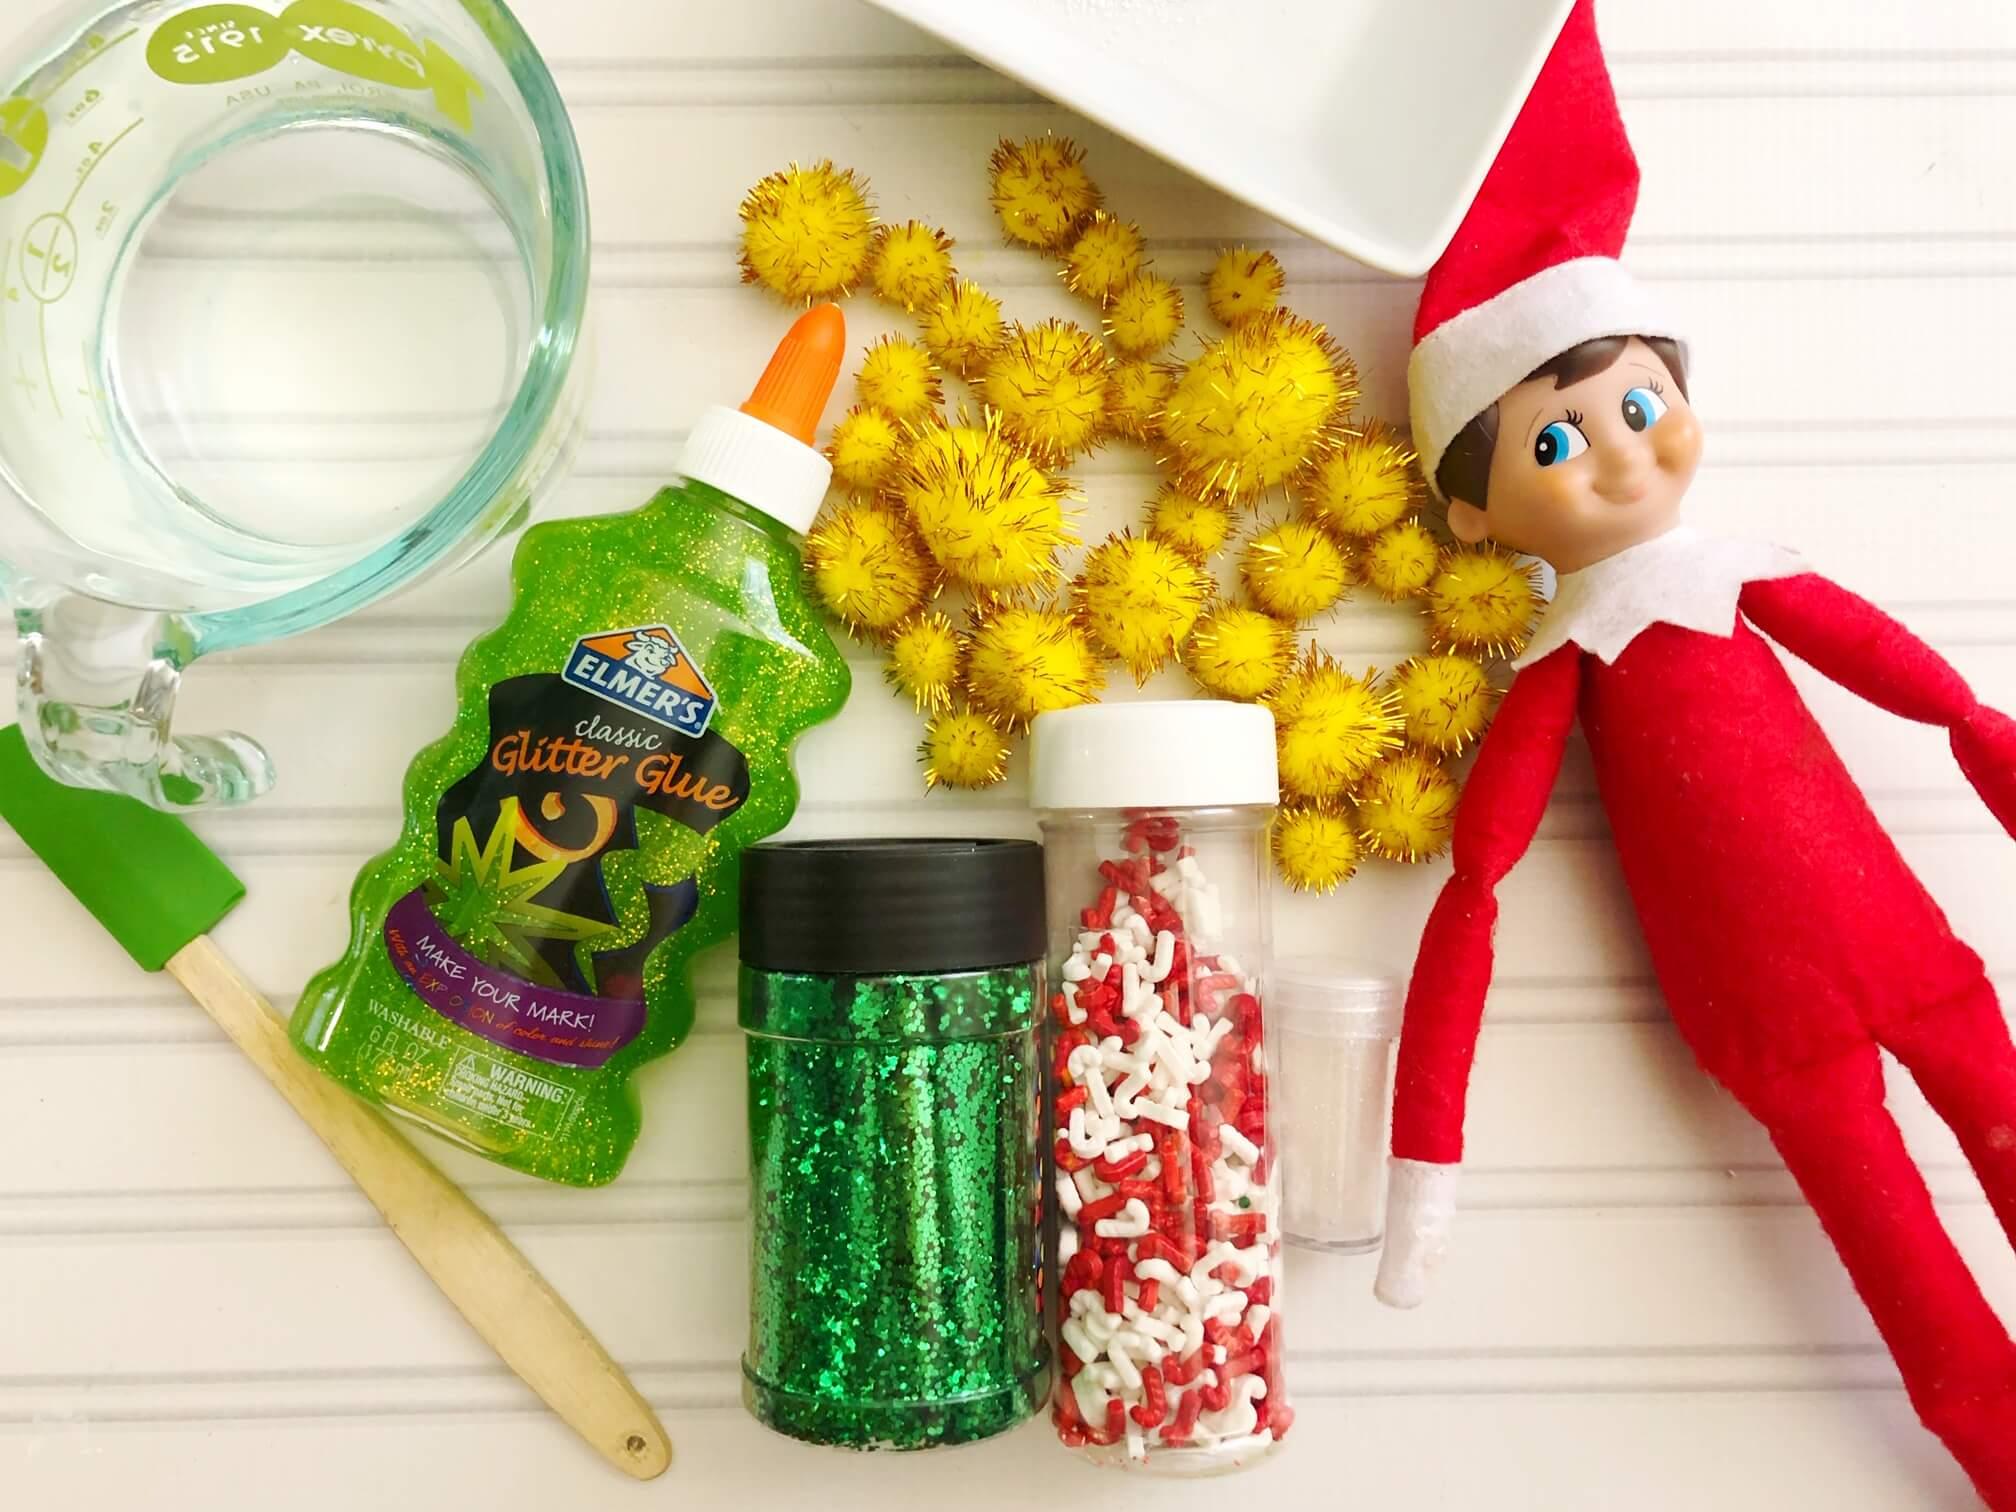 Elf on the Shelf Slime Ingredients for creative Elf on the Shelf set ups